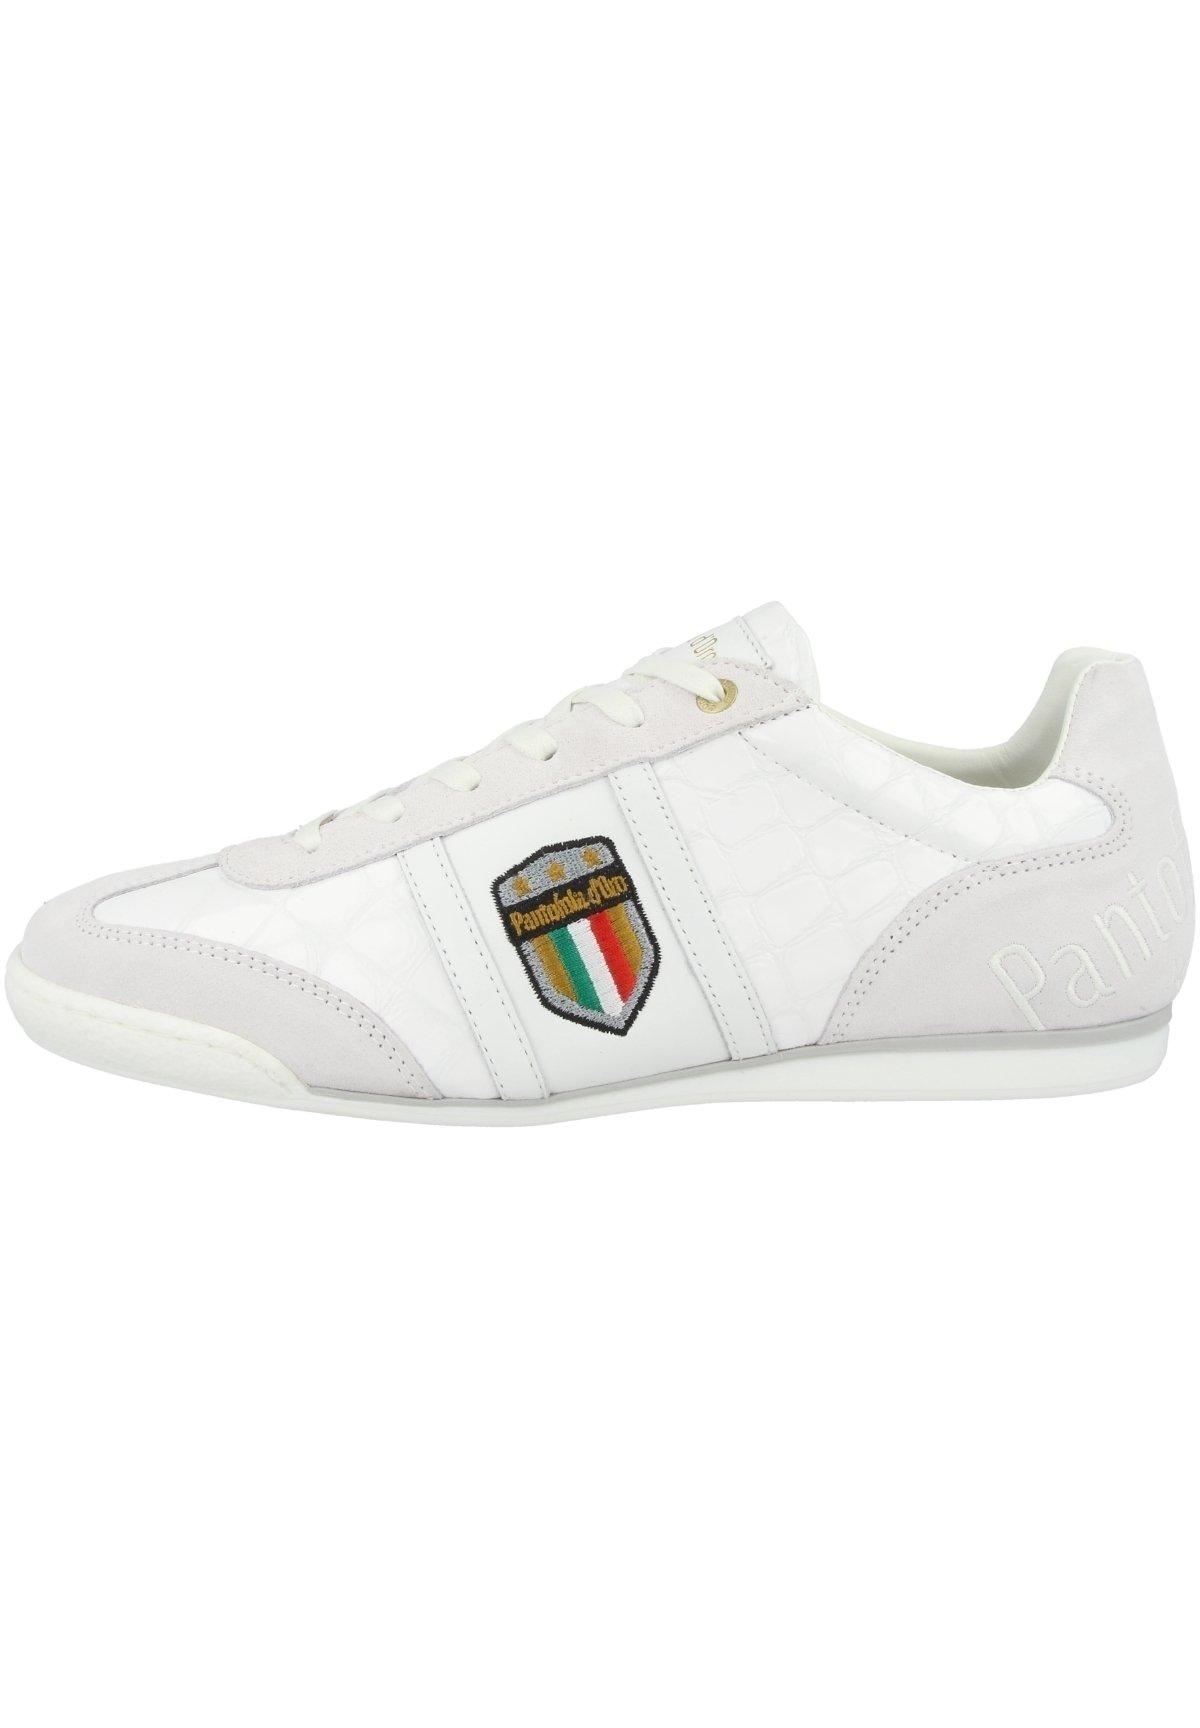 Homme FORTEZZA  - Baskets basses - bright white